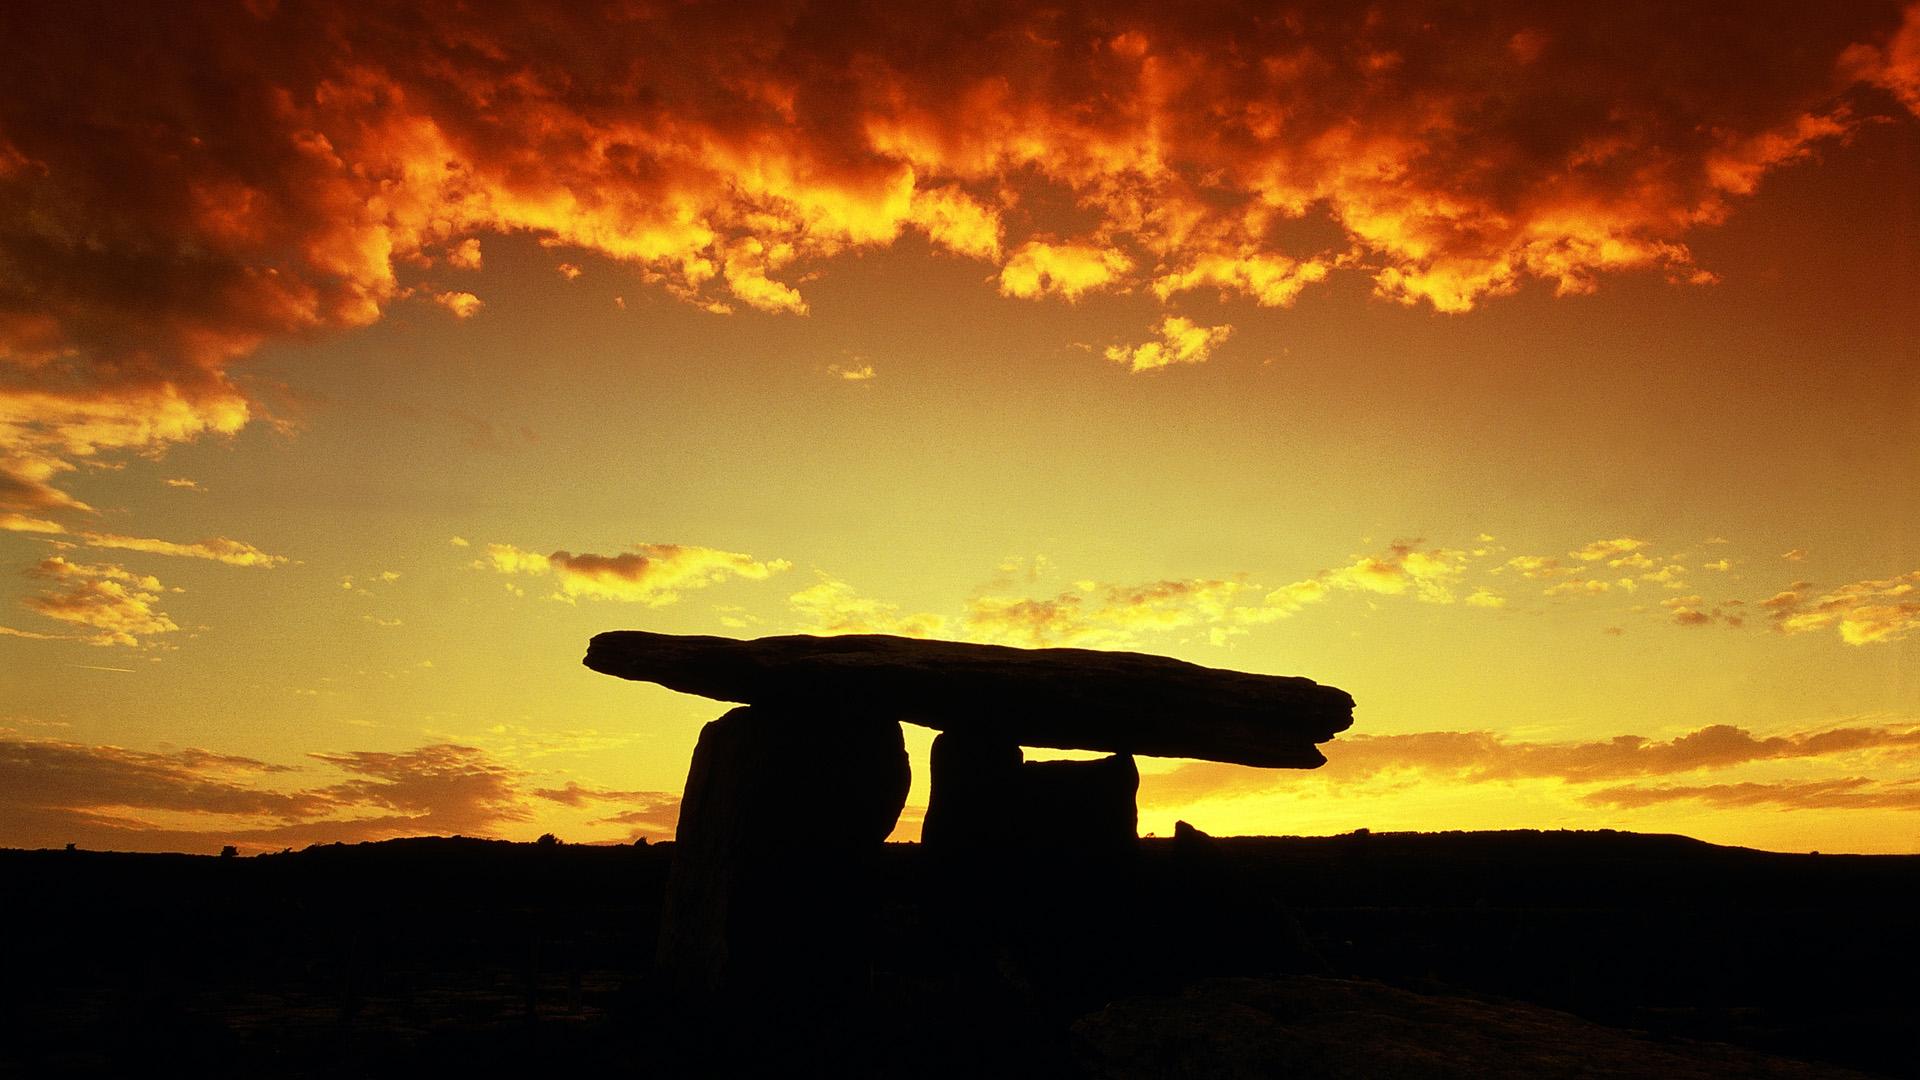 sunset hd wallpaper | background image | 1920x1080 | id:469688